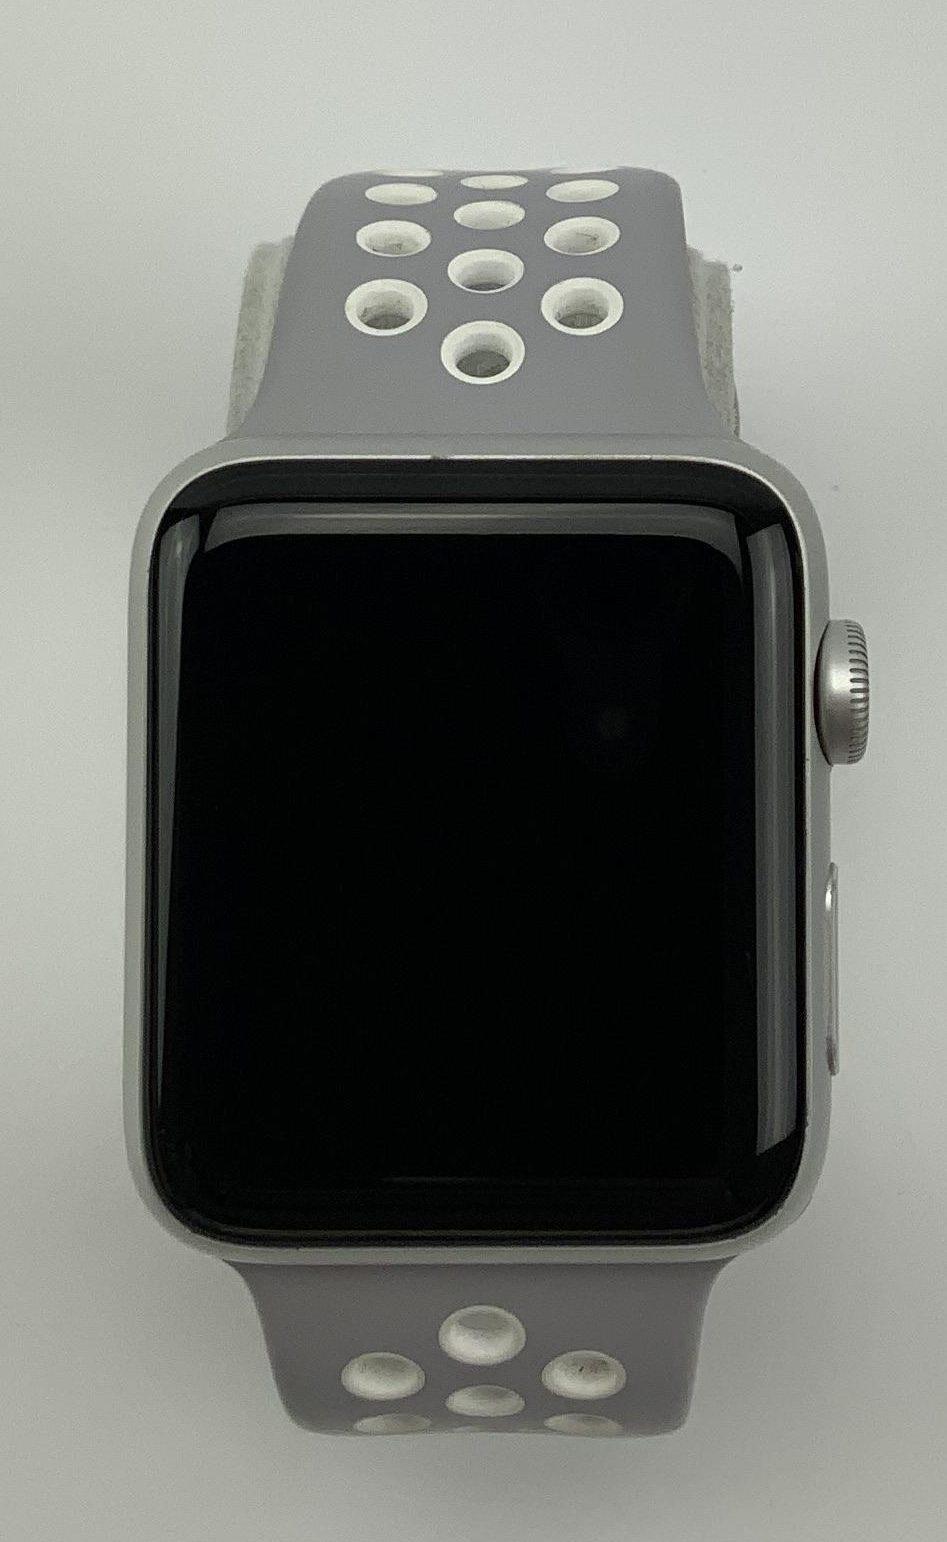 Watch Series 2 Aluminum (42mm), Silver, Grey Nike Sport Band, Bild 1